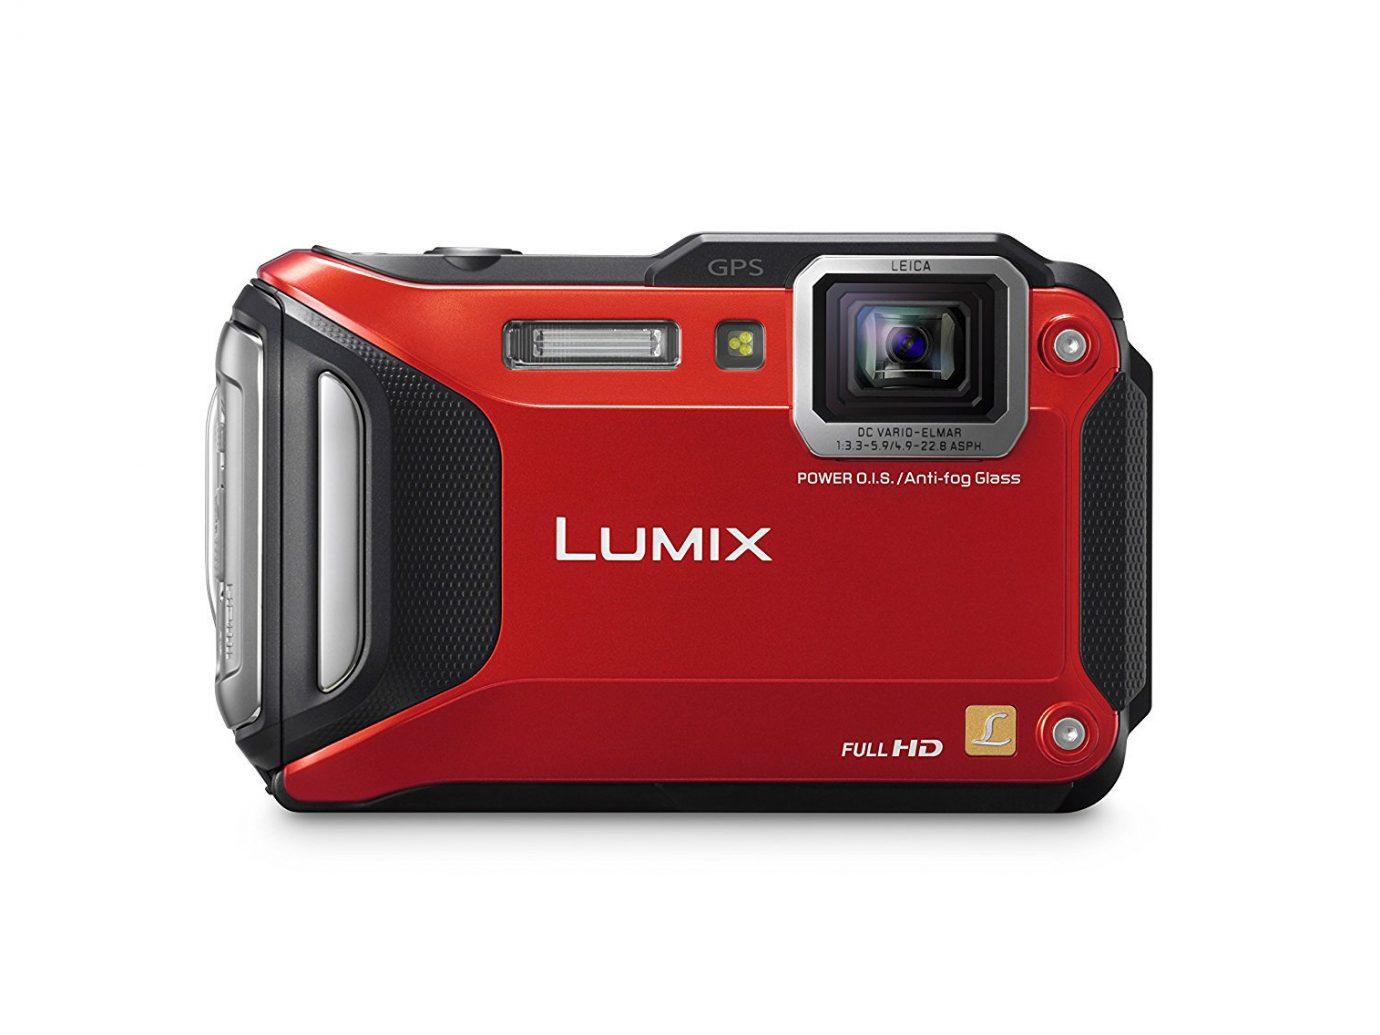 Travel Tips digital camera camera cameras & optics electronics product magenta